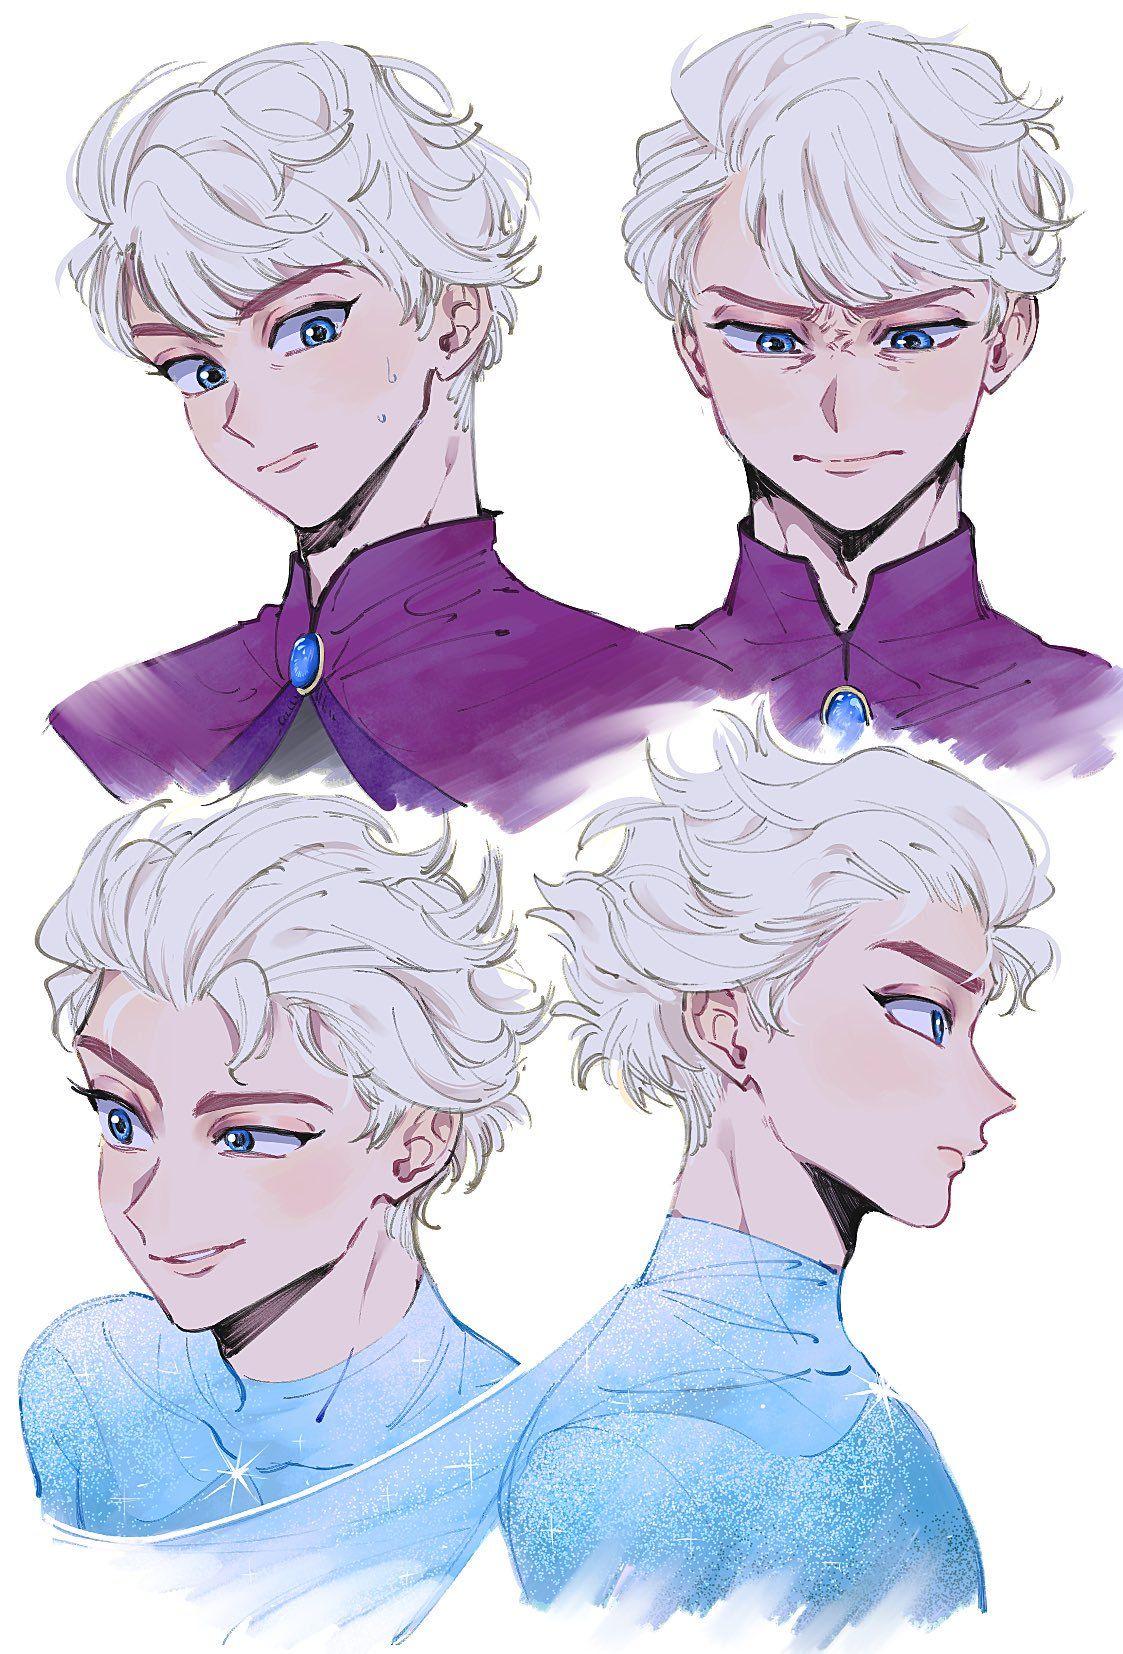 Pop On In 2020 With Images Disney Princess Anime Disney Art Disney Drawings